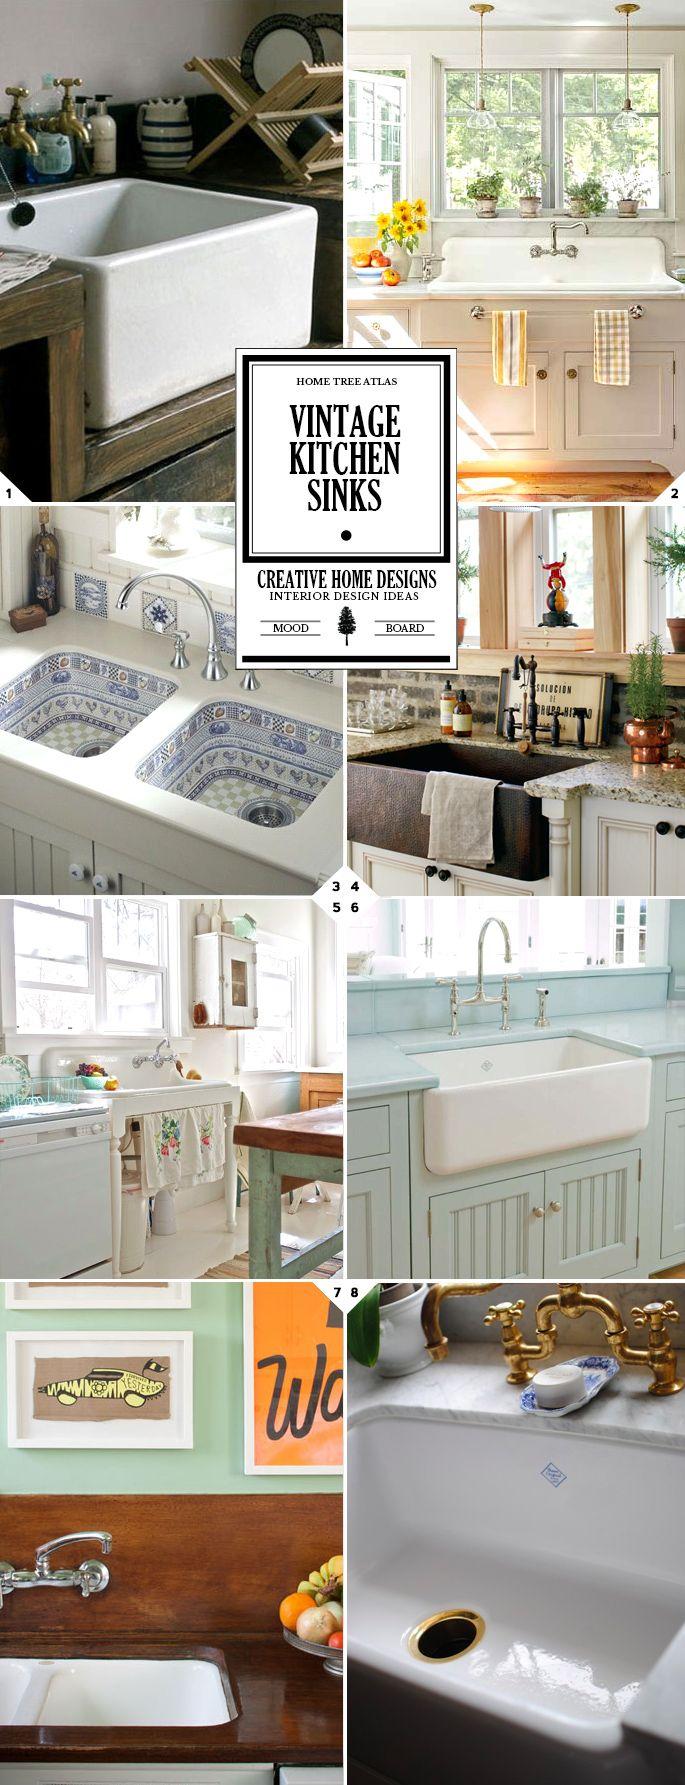 Best Images About Vintage Home Decor Ideas On Pinterest - Home designs interior